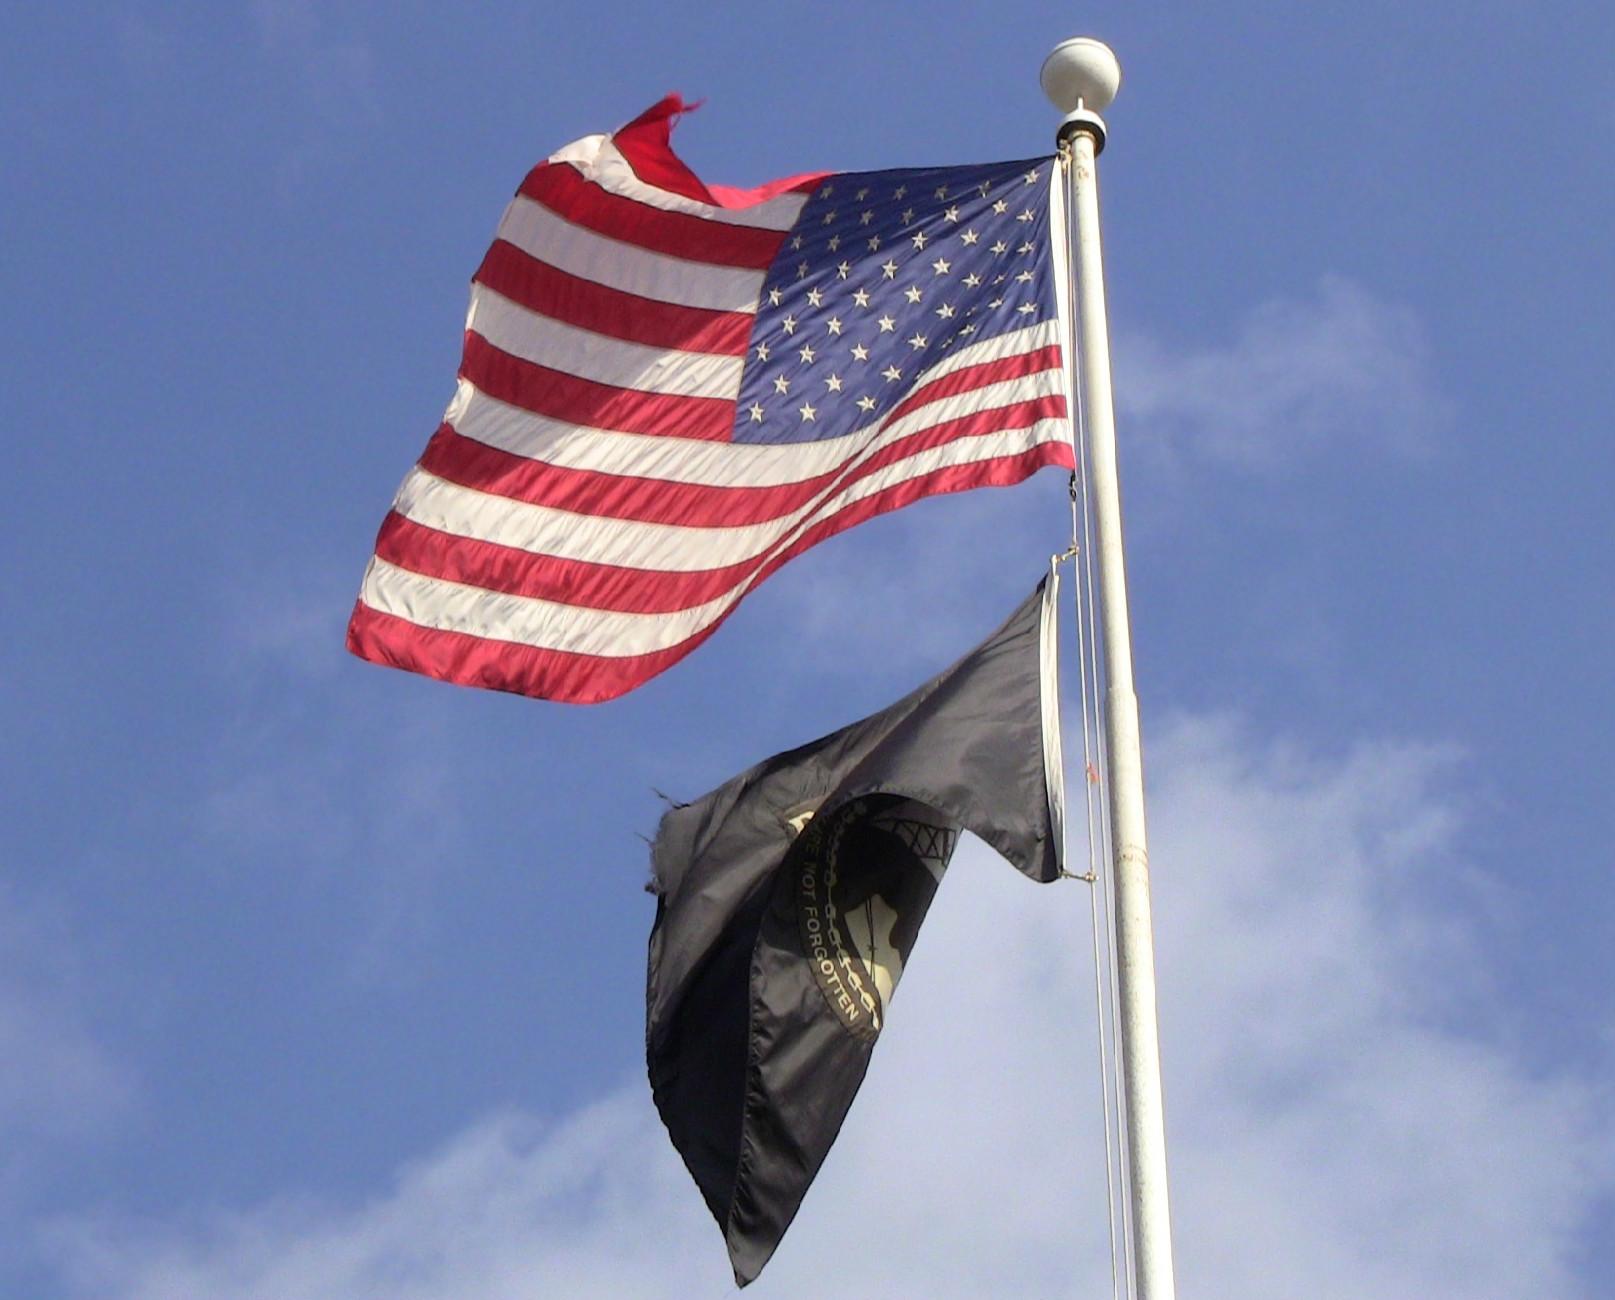 0ba941c01982627b350f_US_and_POW-MIA_flags_in_Fanwood.jpg